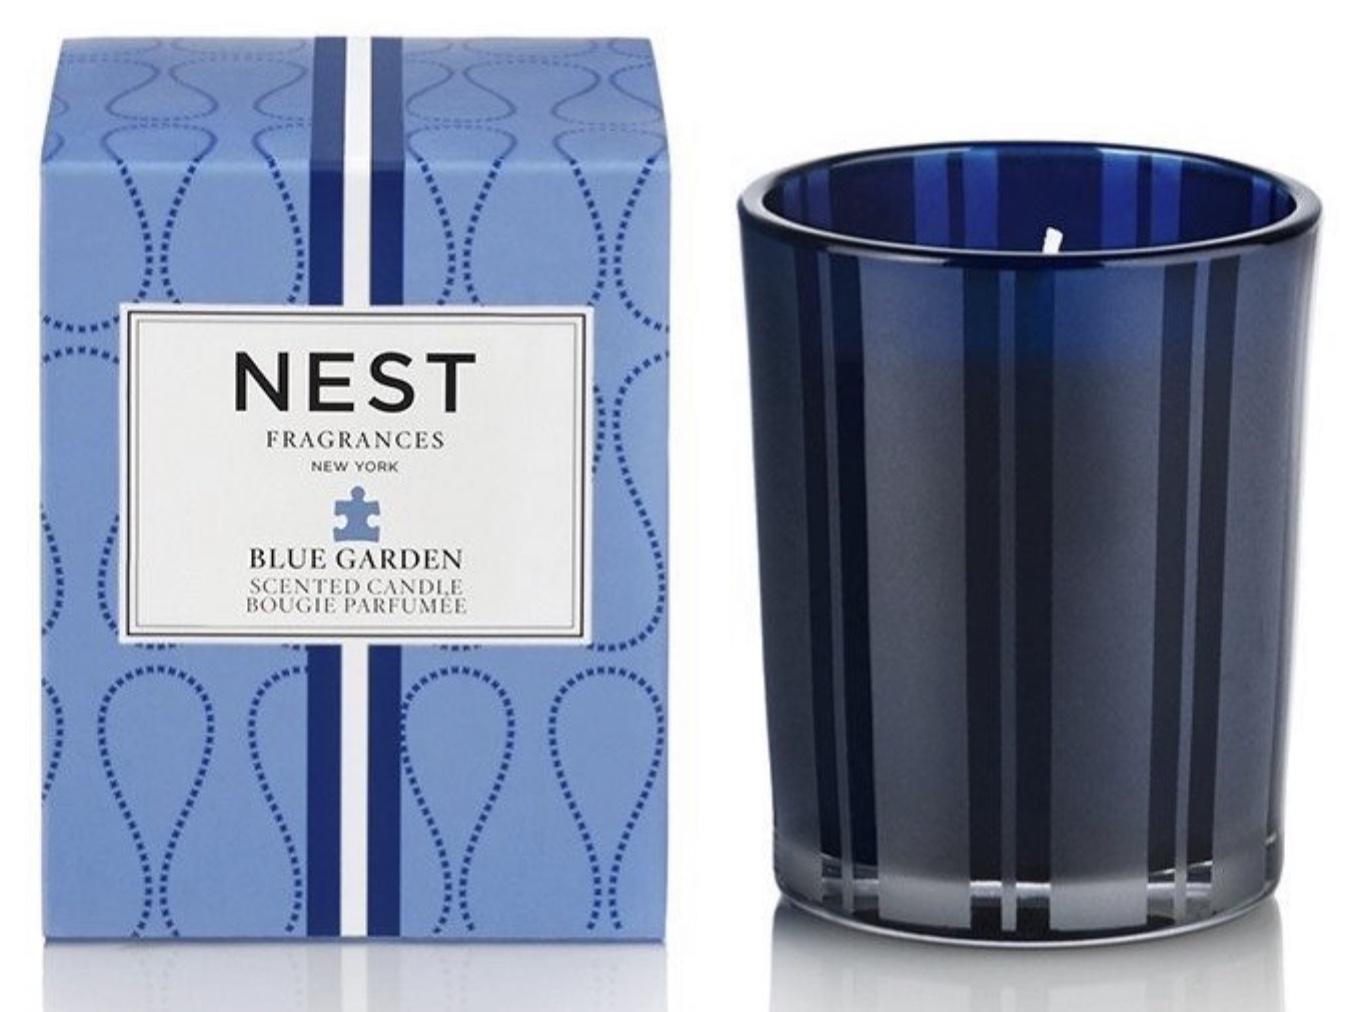 Blue Garden Votive Candle by Nest